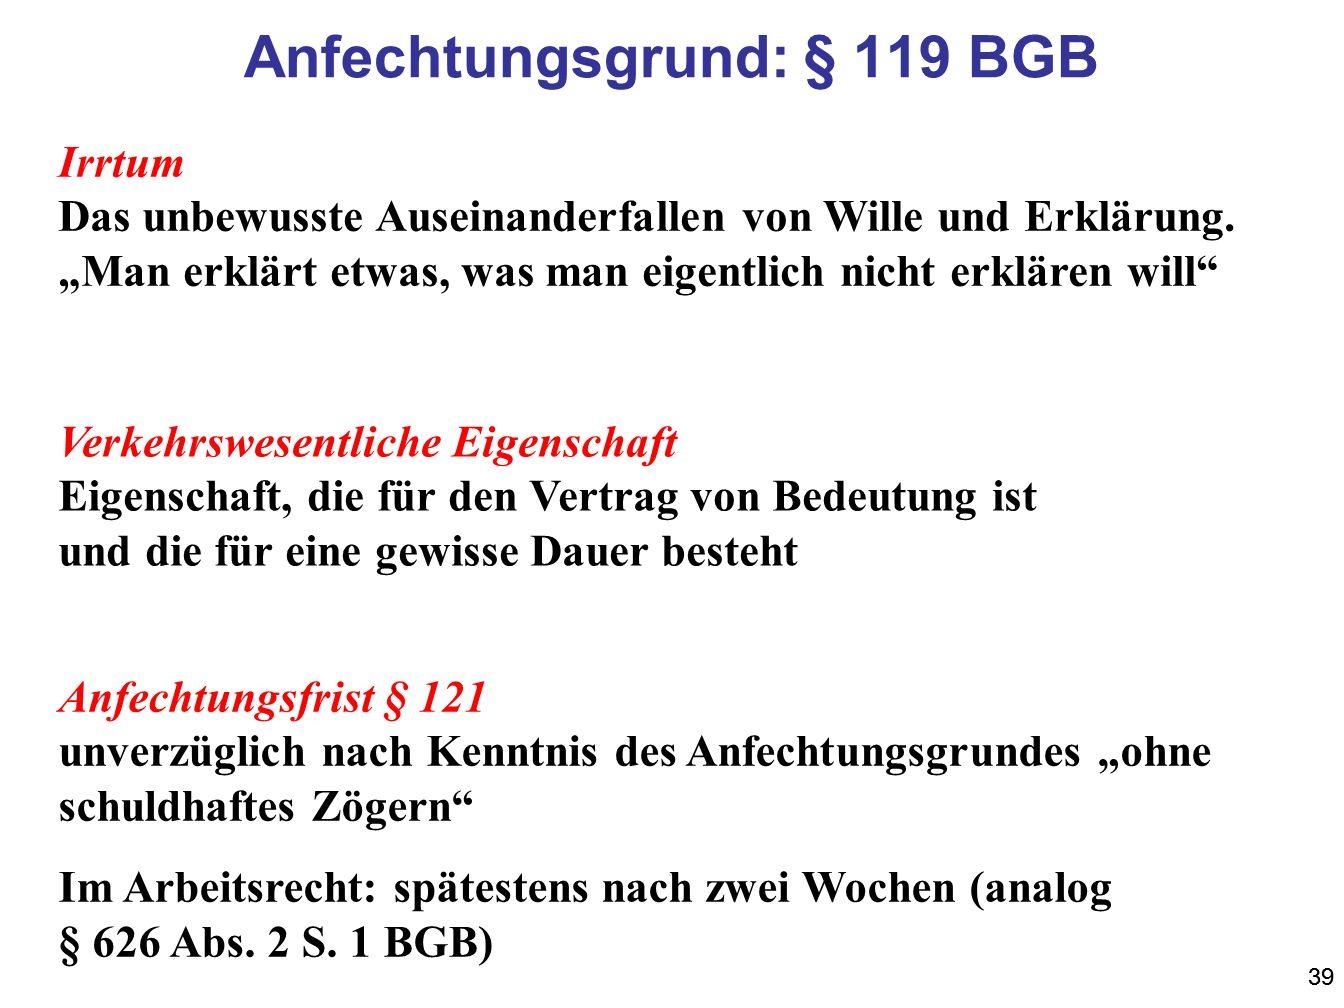 Anfechtungsgrund: § 119 BGB